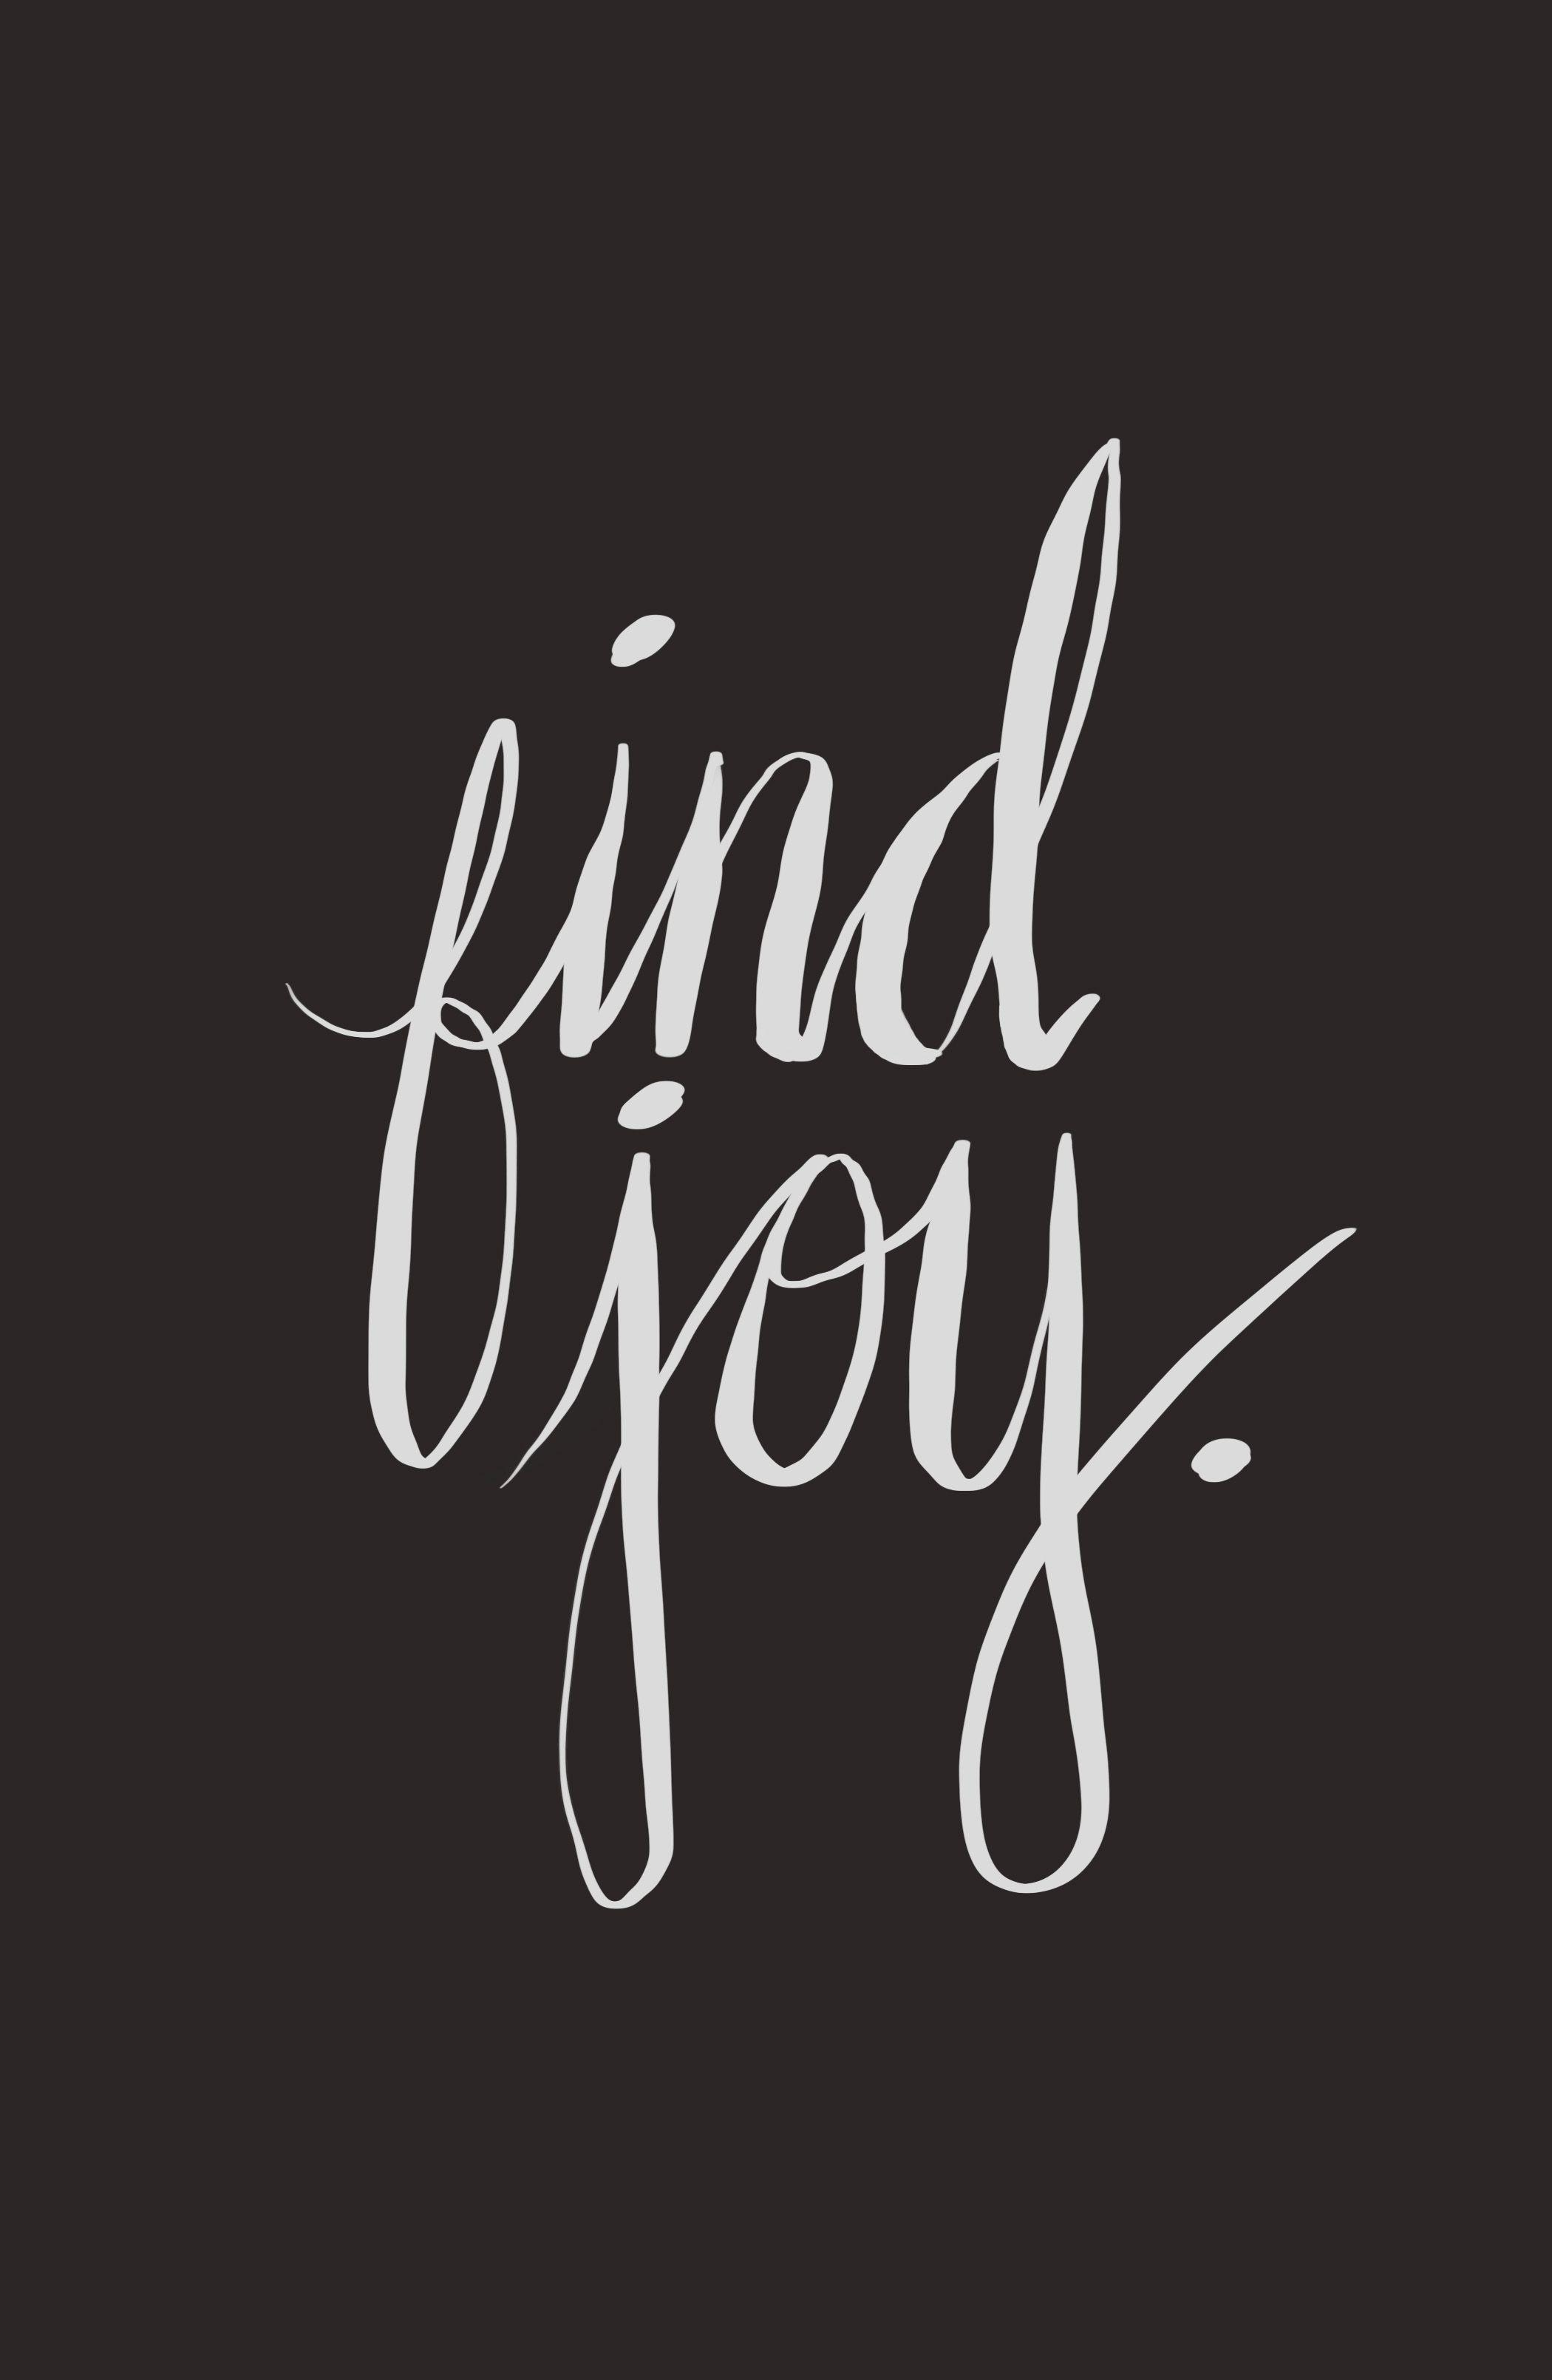 Find Joy | Words + Wisdom | Iphone wallpaper quotes bible, Phone wallpaper quotes, Verses wallpaper